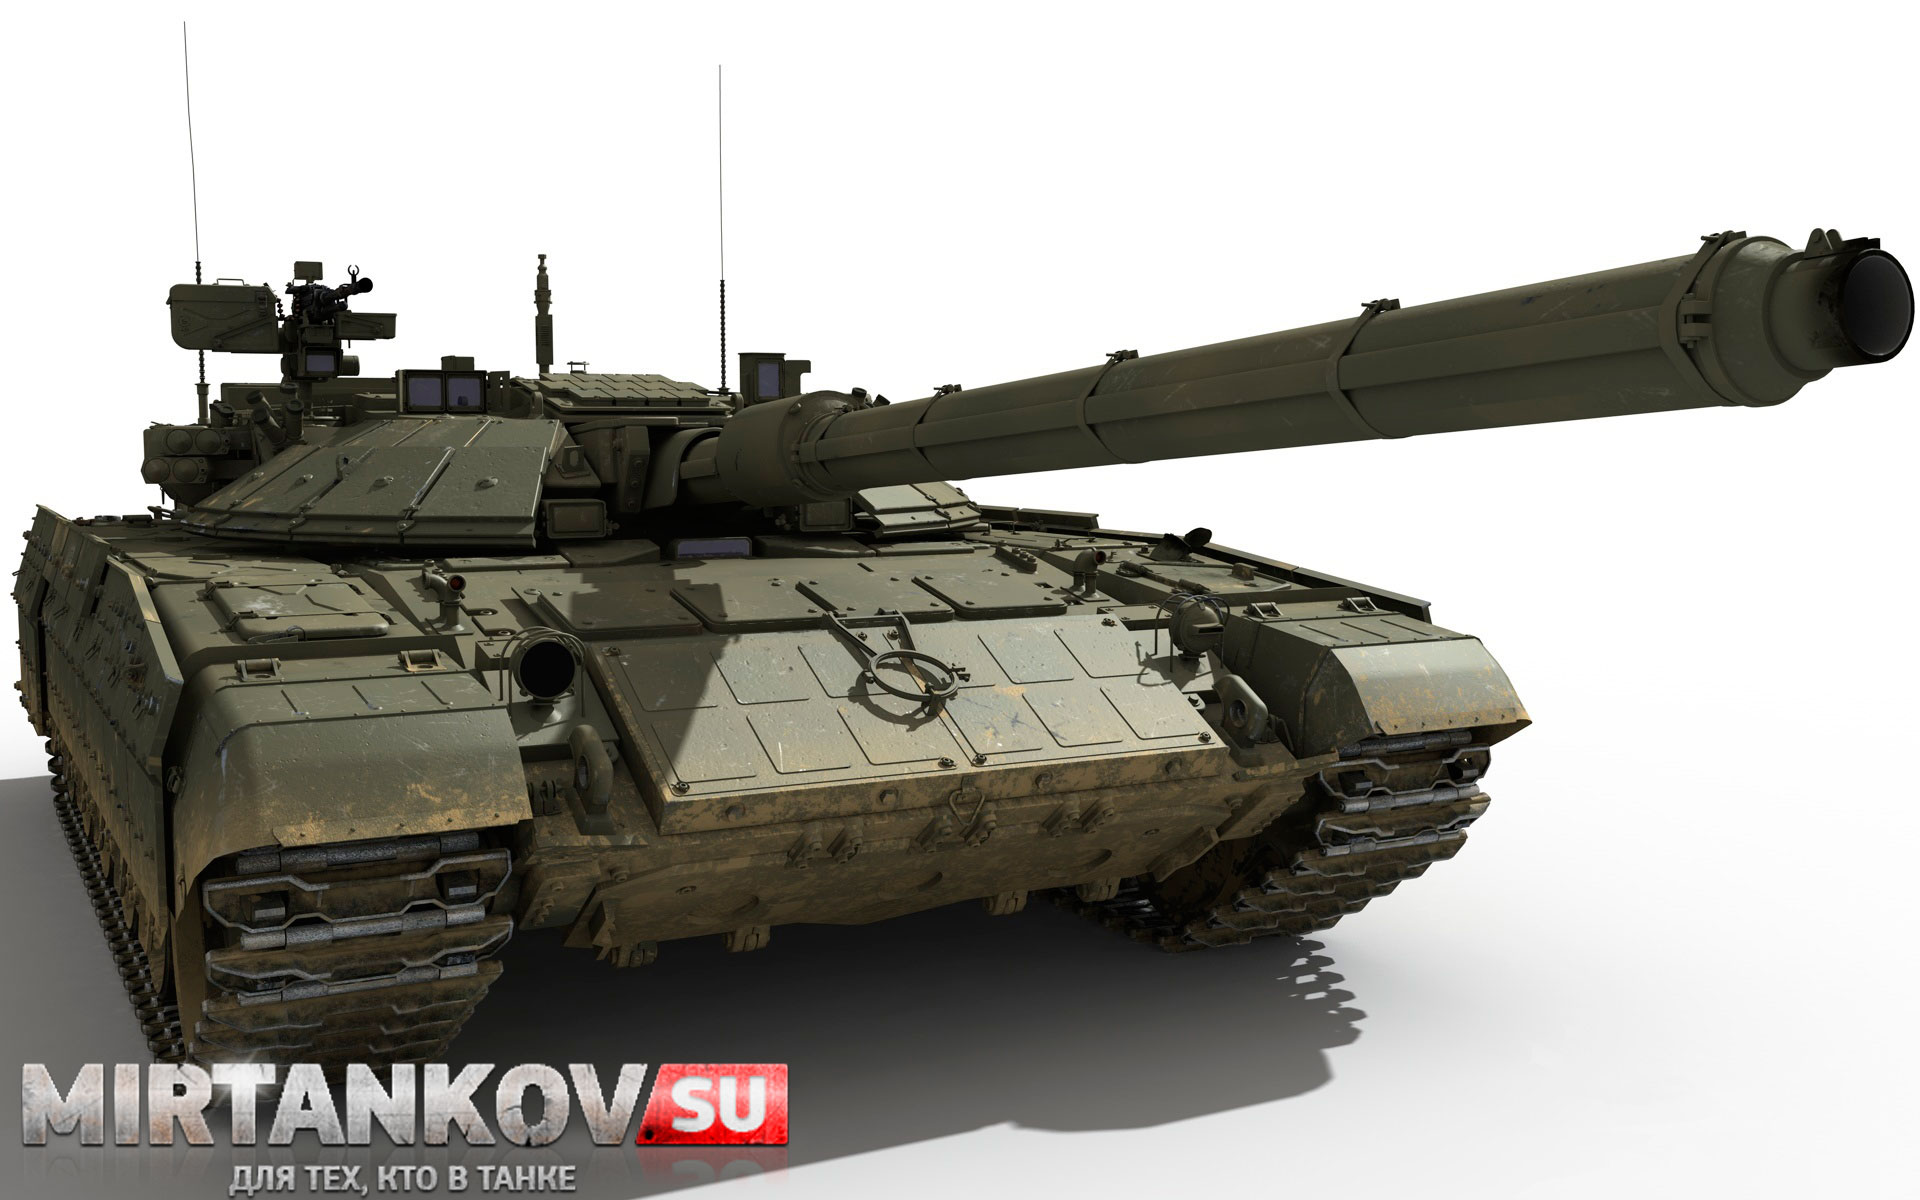 Армата танк мечты уже скоро